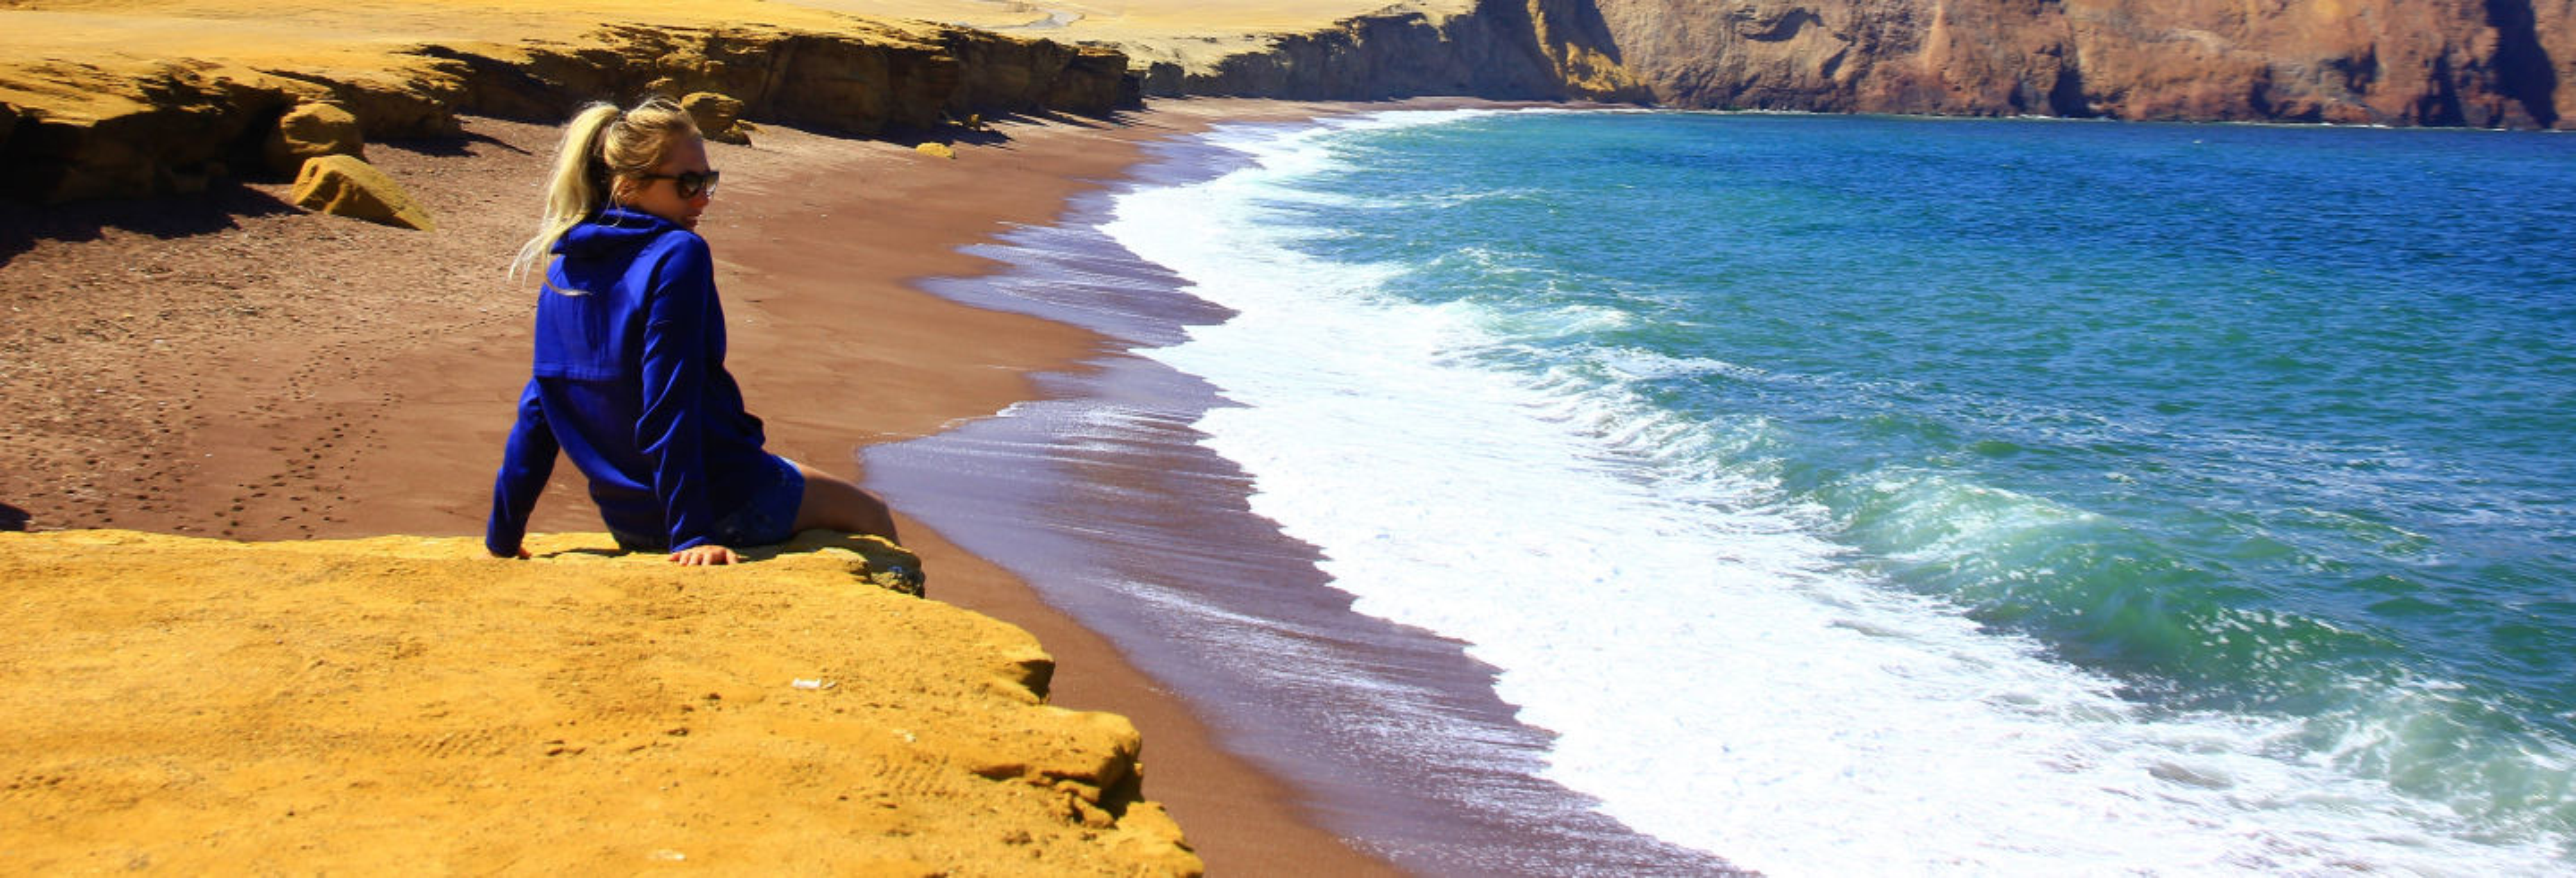 Excursión privada desde Paracas